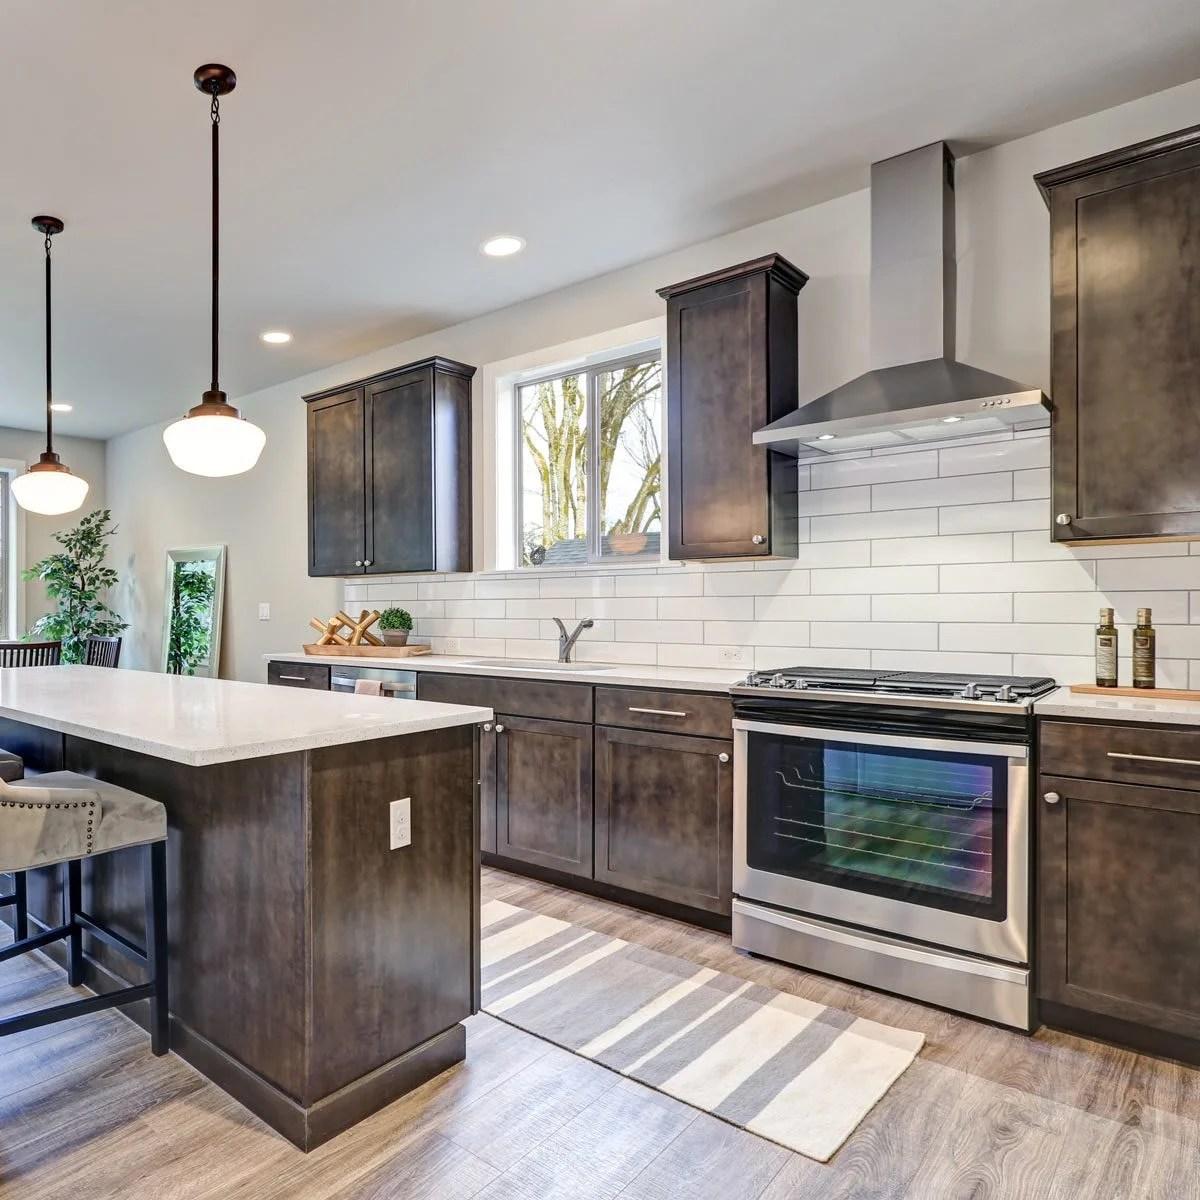 Best Kitchen Backsplash Ideas For Dark Cabinets | Family ... on Backsplash Ideas For Dark Cabinets And Light Countertops  id=79910